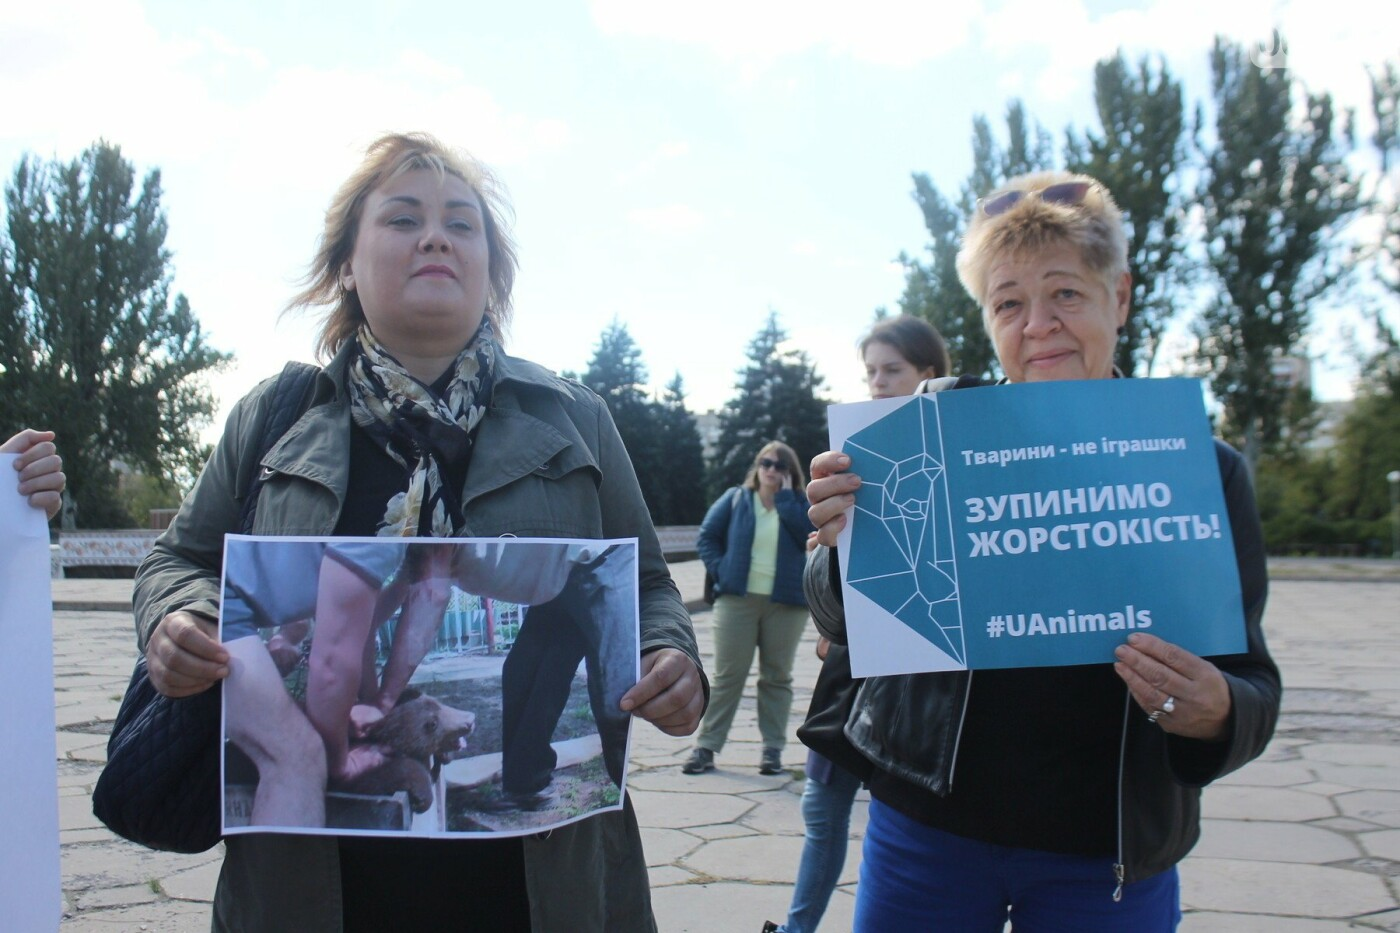 «Защити! Не мучай»: в Запорожье провели марш за права животных, – ФОТОРЕПОРТАЖ, ВИДЕО, фото-6